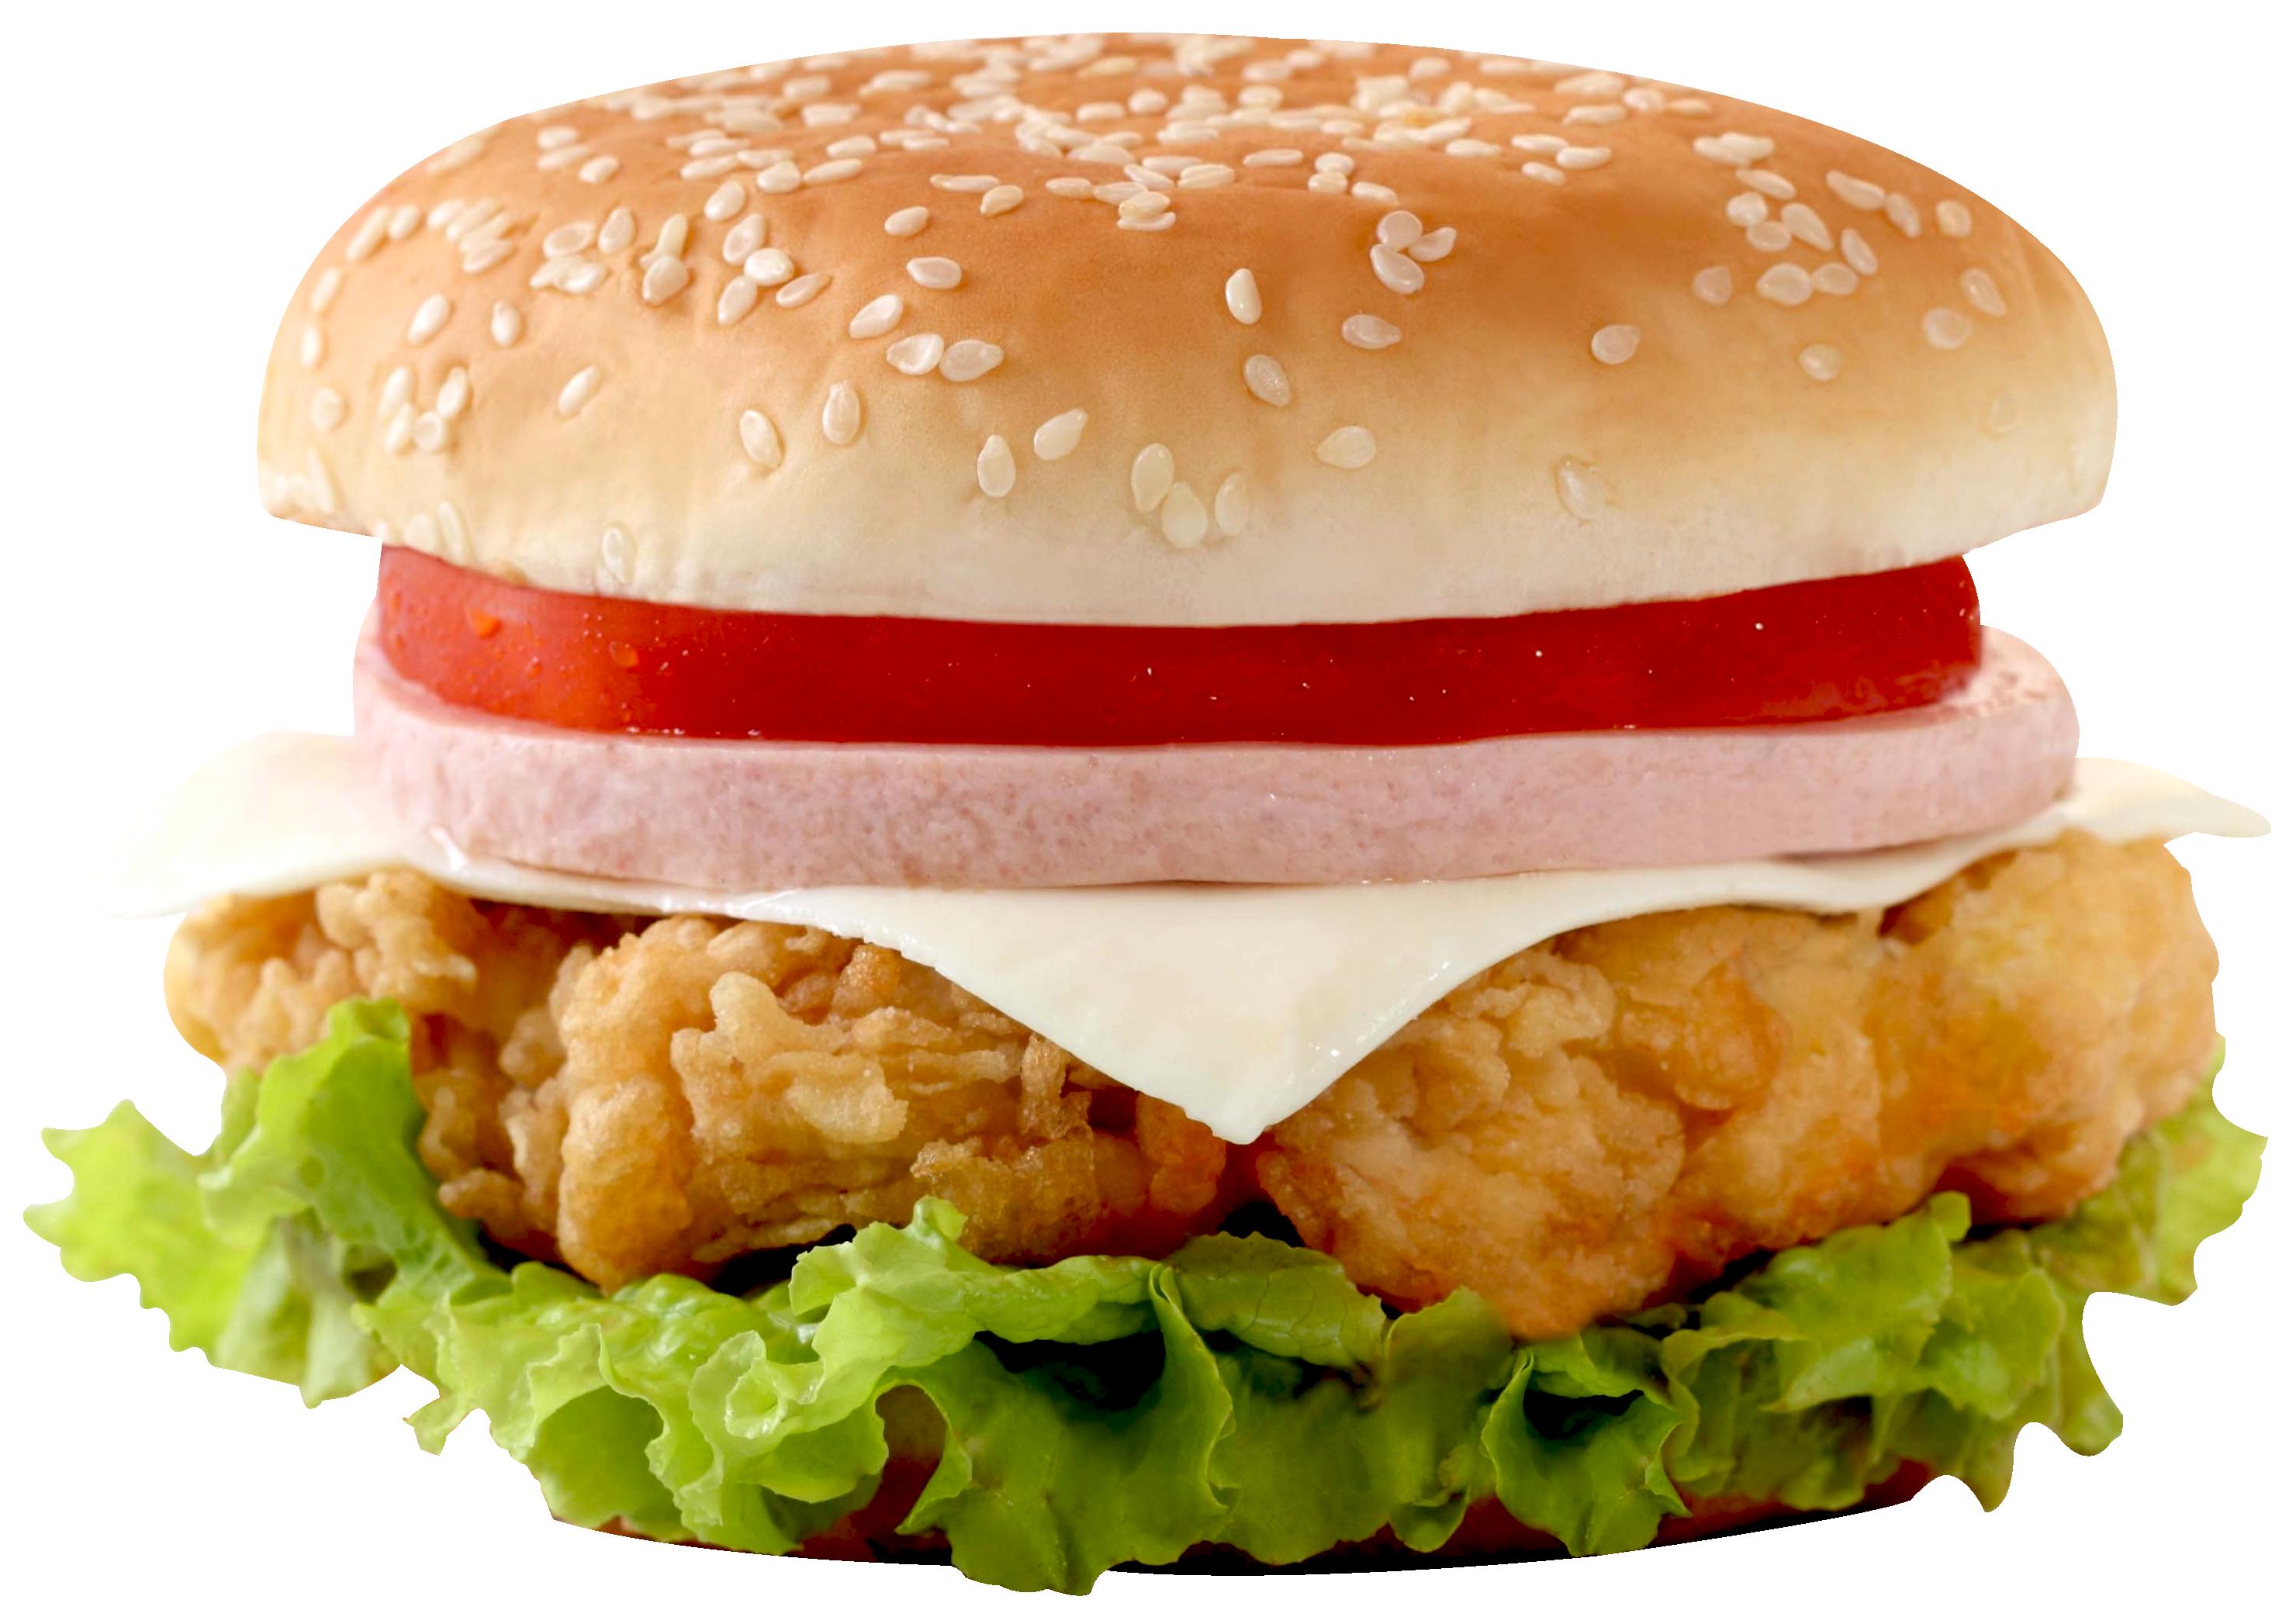 Burger PNG-PlusPNG pluspng.com-2960 - Burger PNG - Burger PNG HD